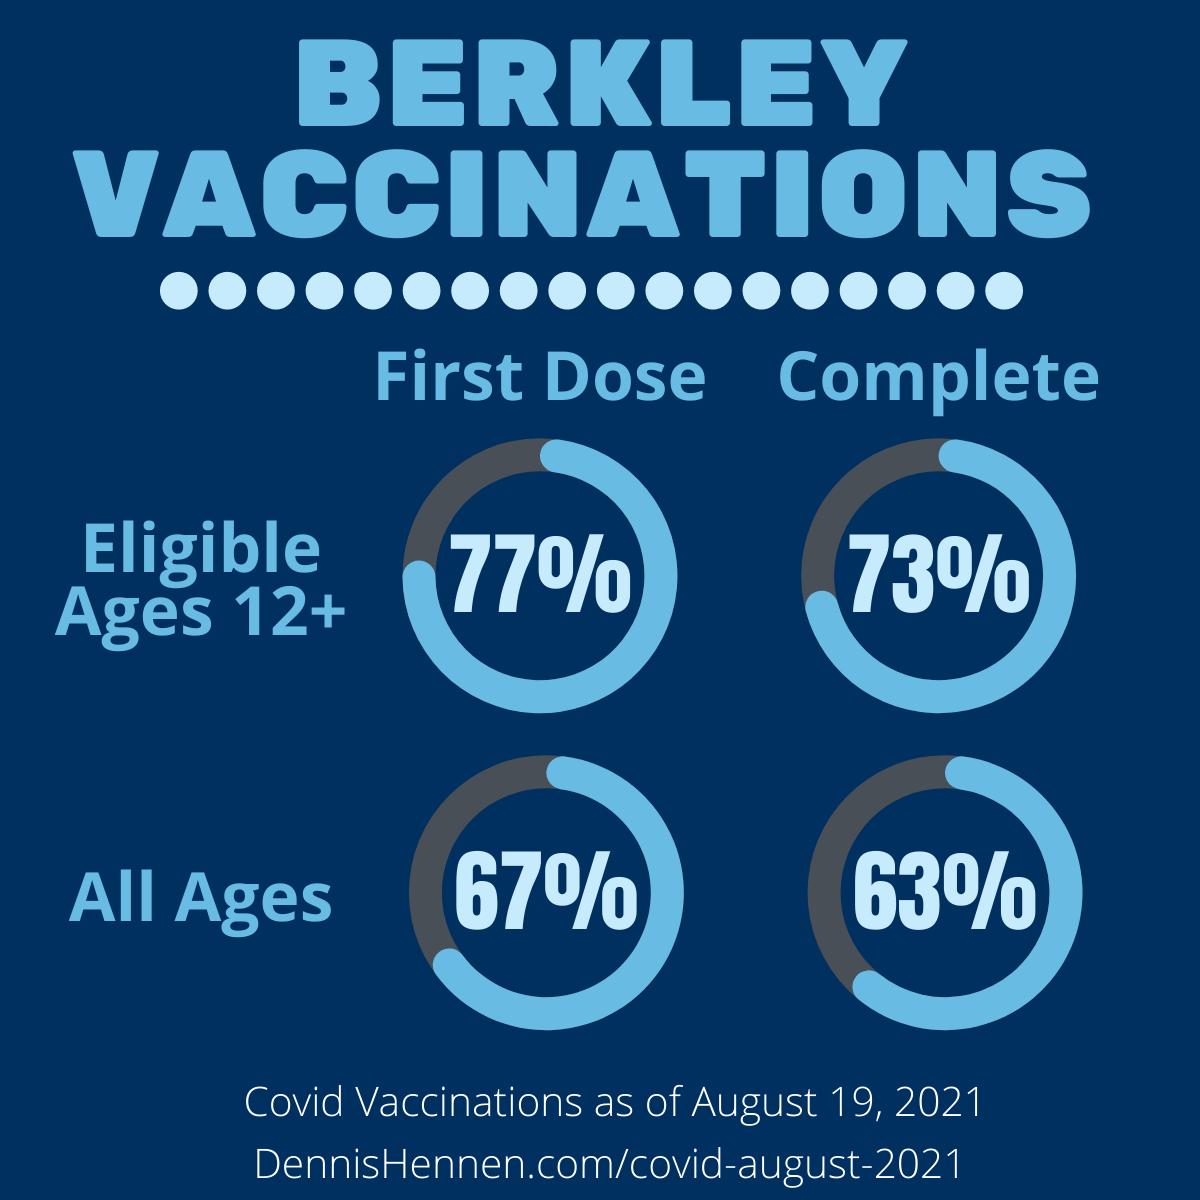 Berkley Overall Vaccination Rates